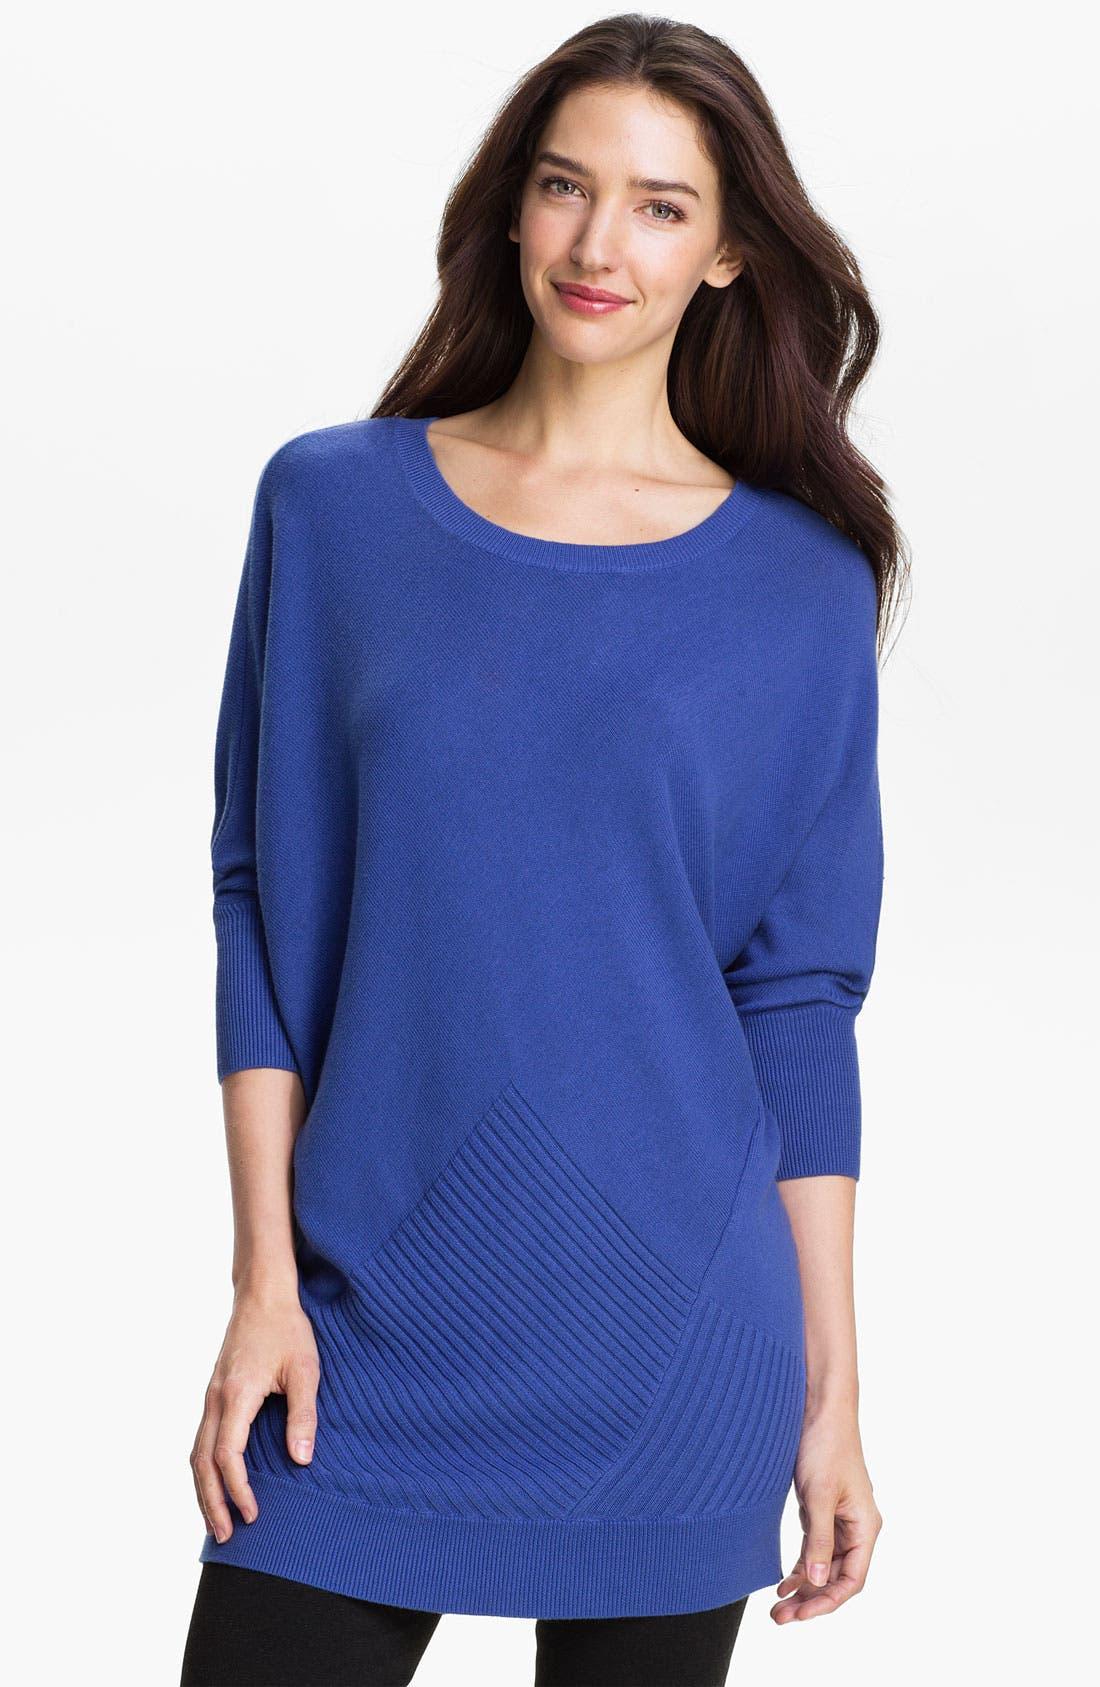 Alternate Image 1 Selected - Halogen® Three Quarter Sleeve Tunic Sweater